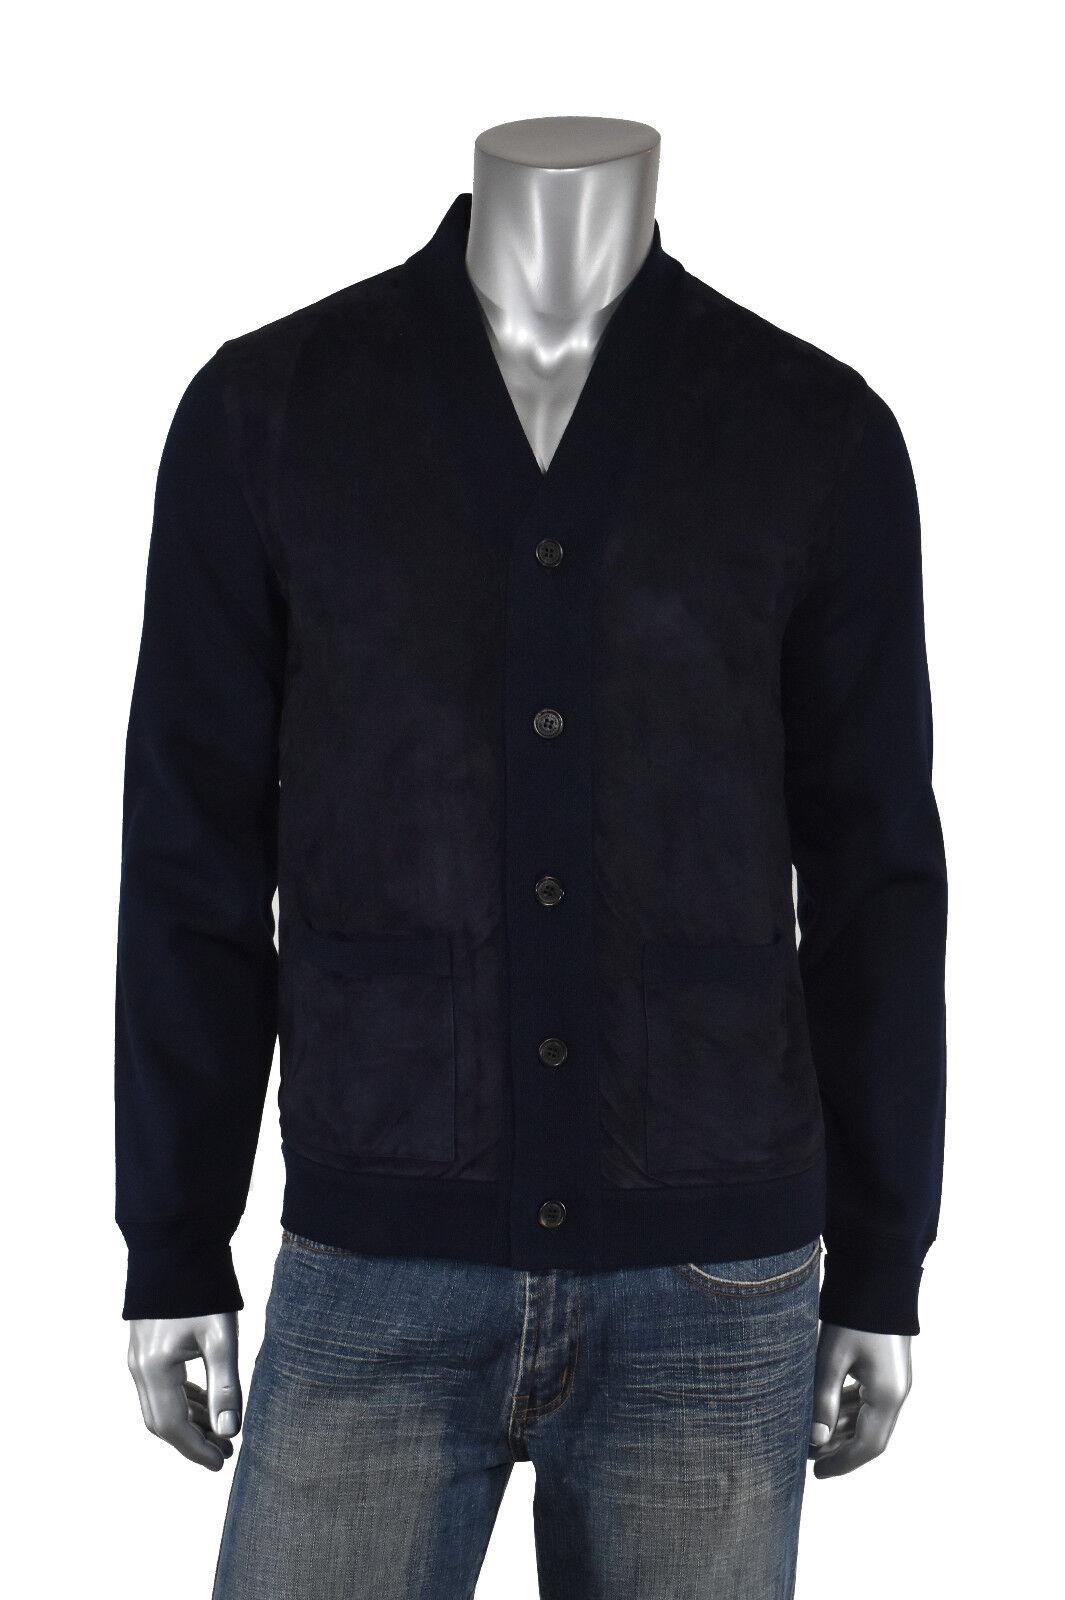 Ralph Lauren lila Label Navy Cotton Suede Leder Cardigan Sweater New 1495